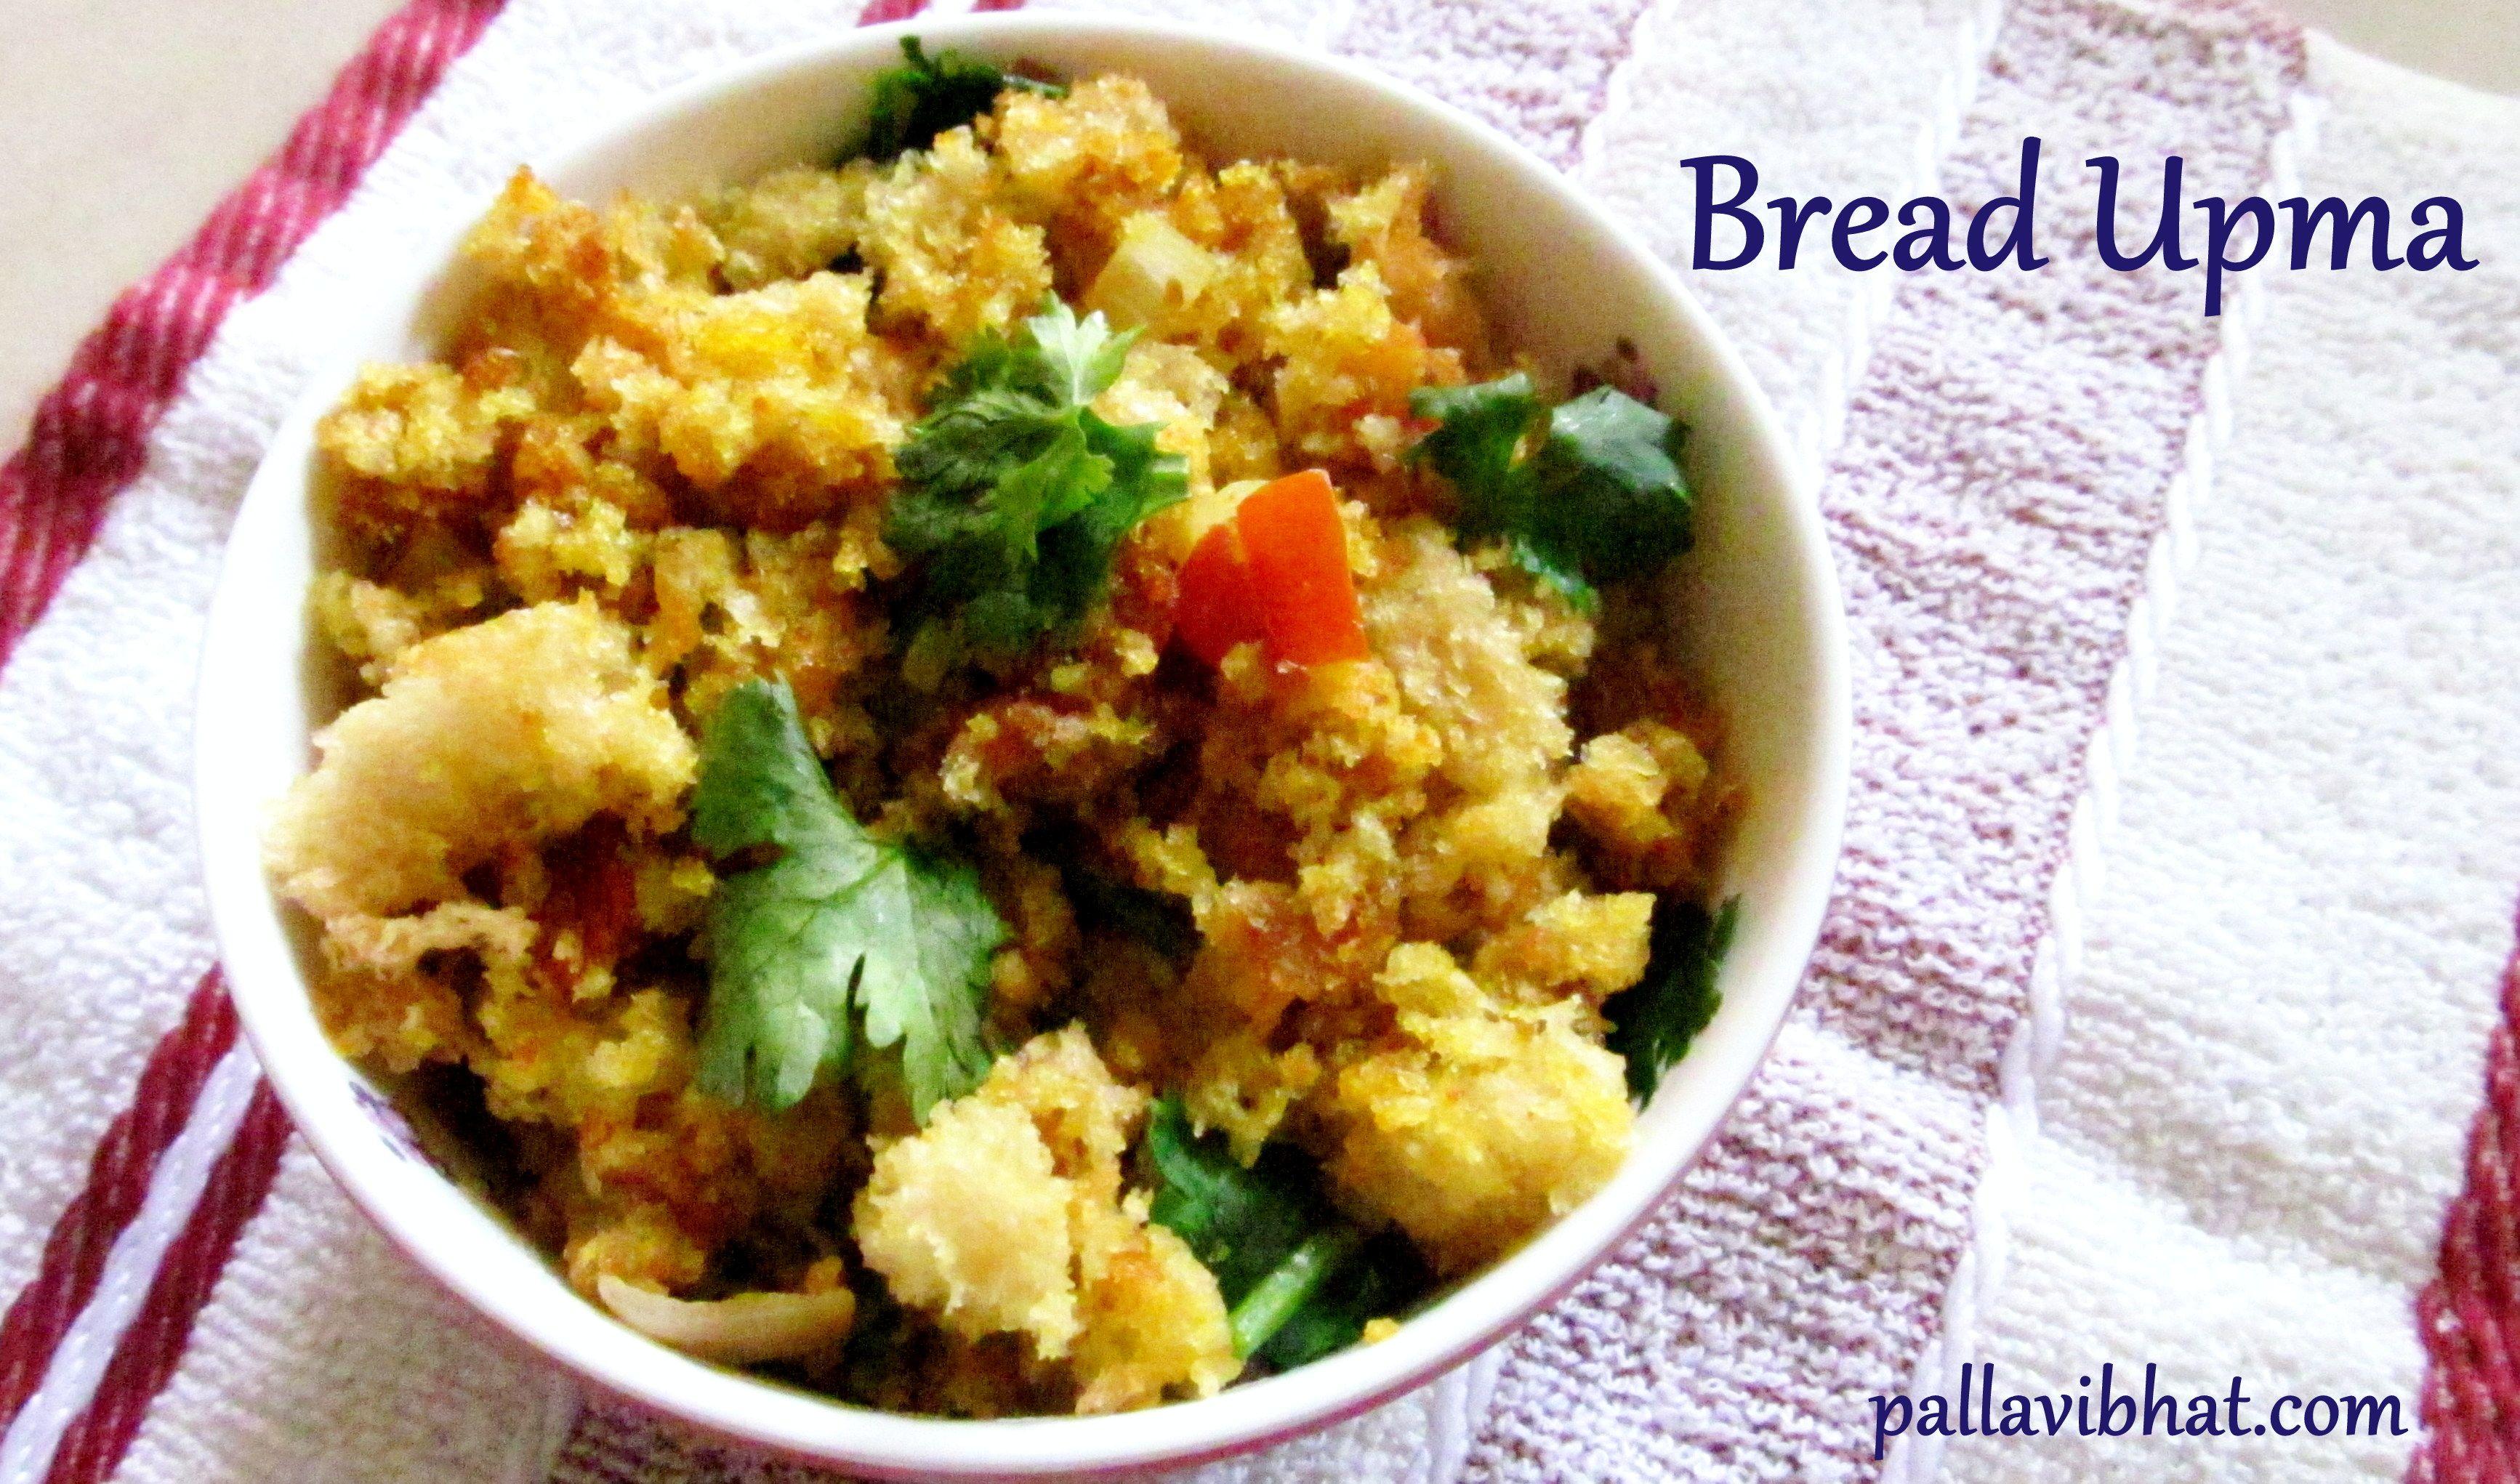 Bread upma recipe south indian bread upma recipe